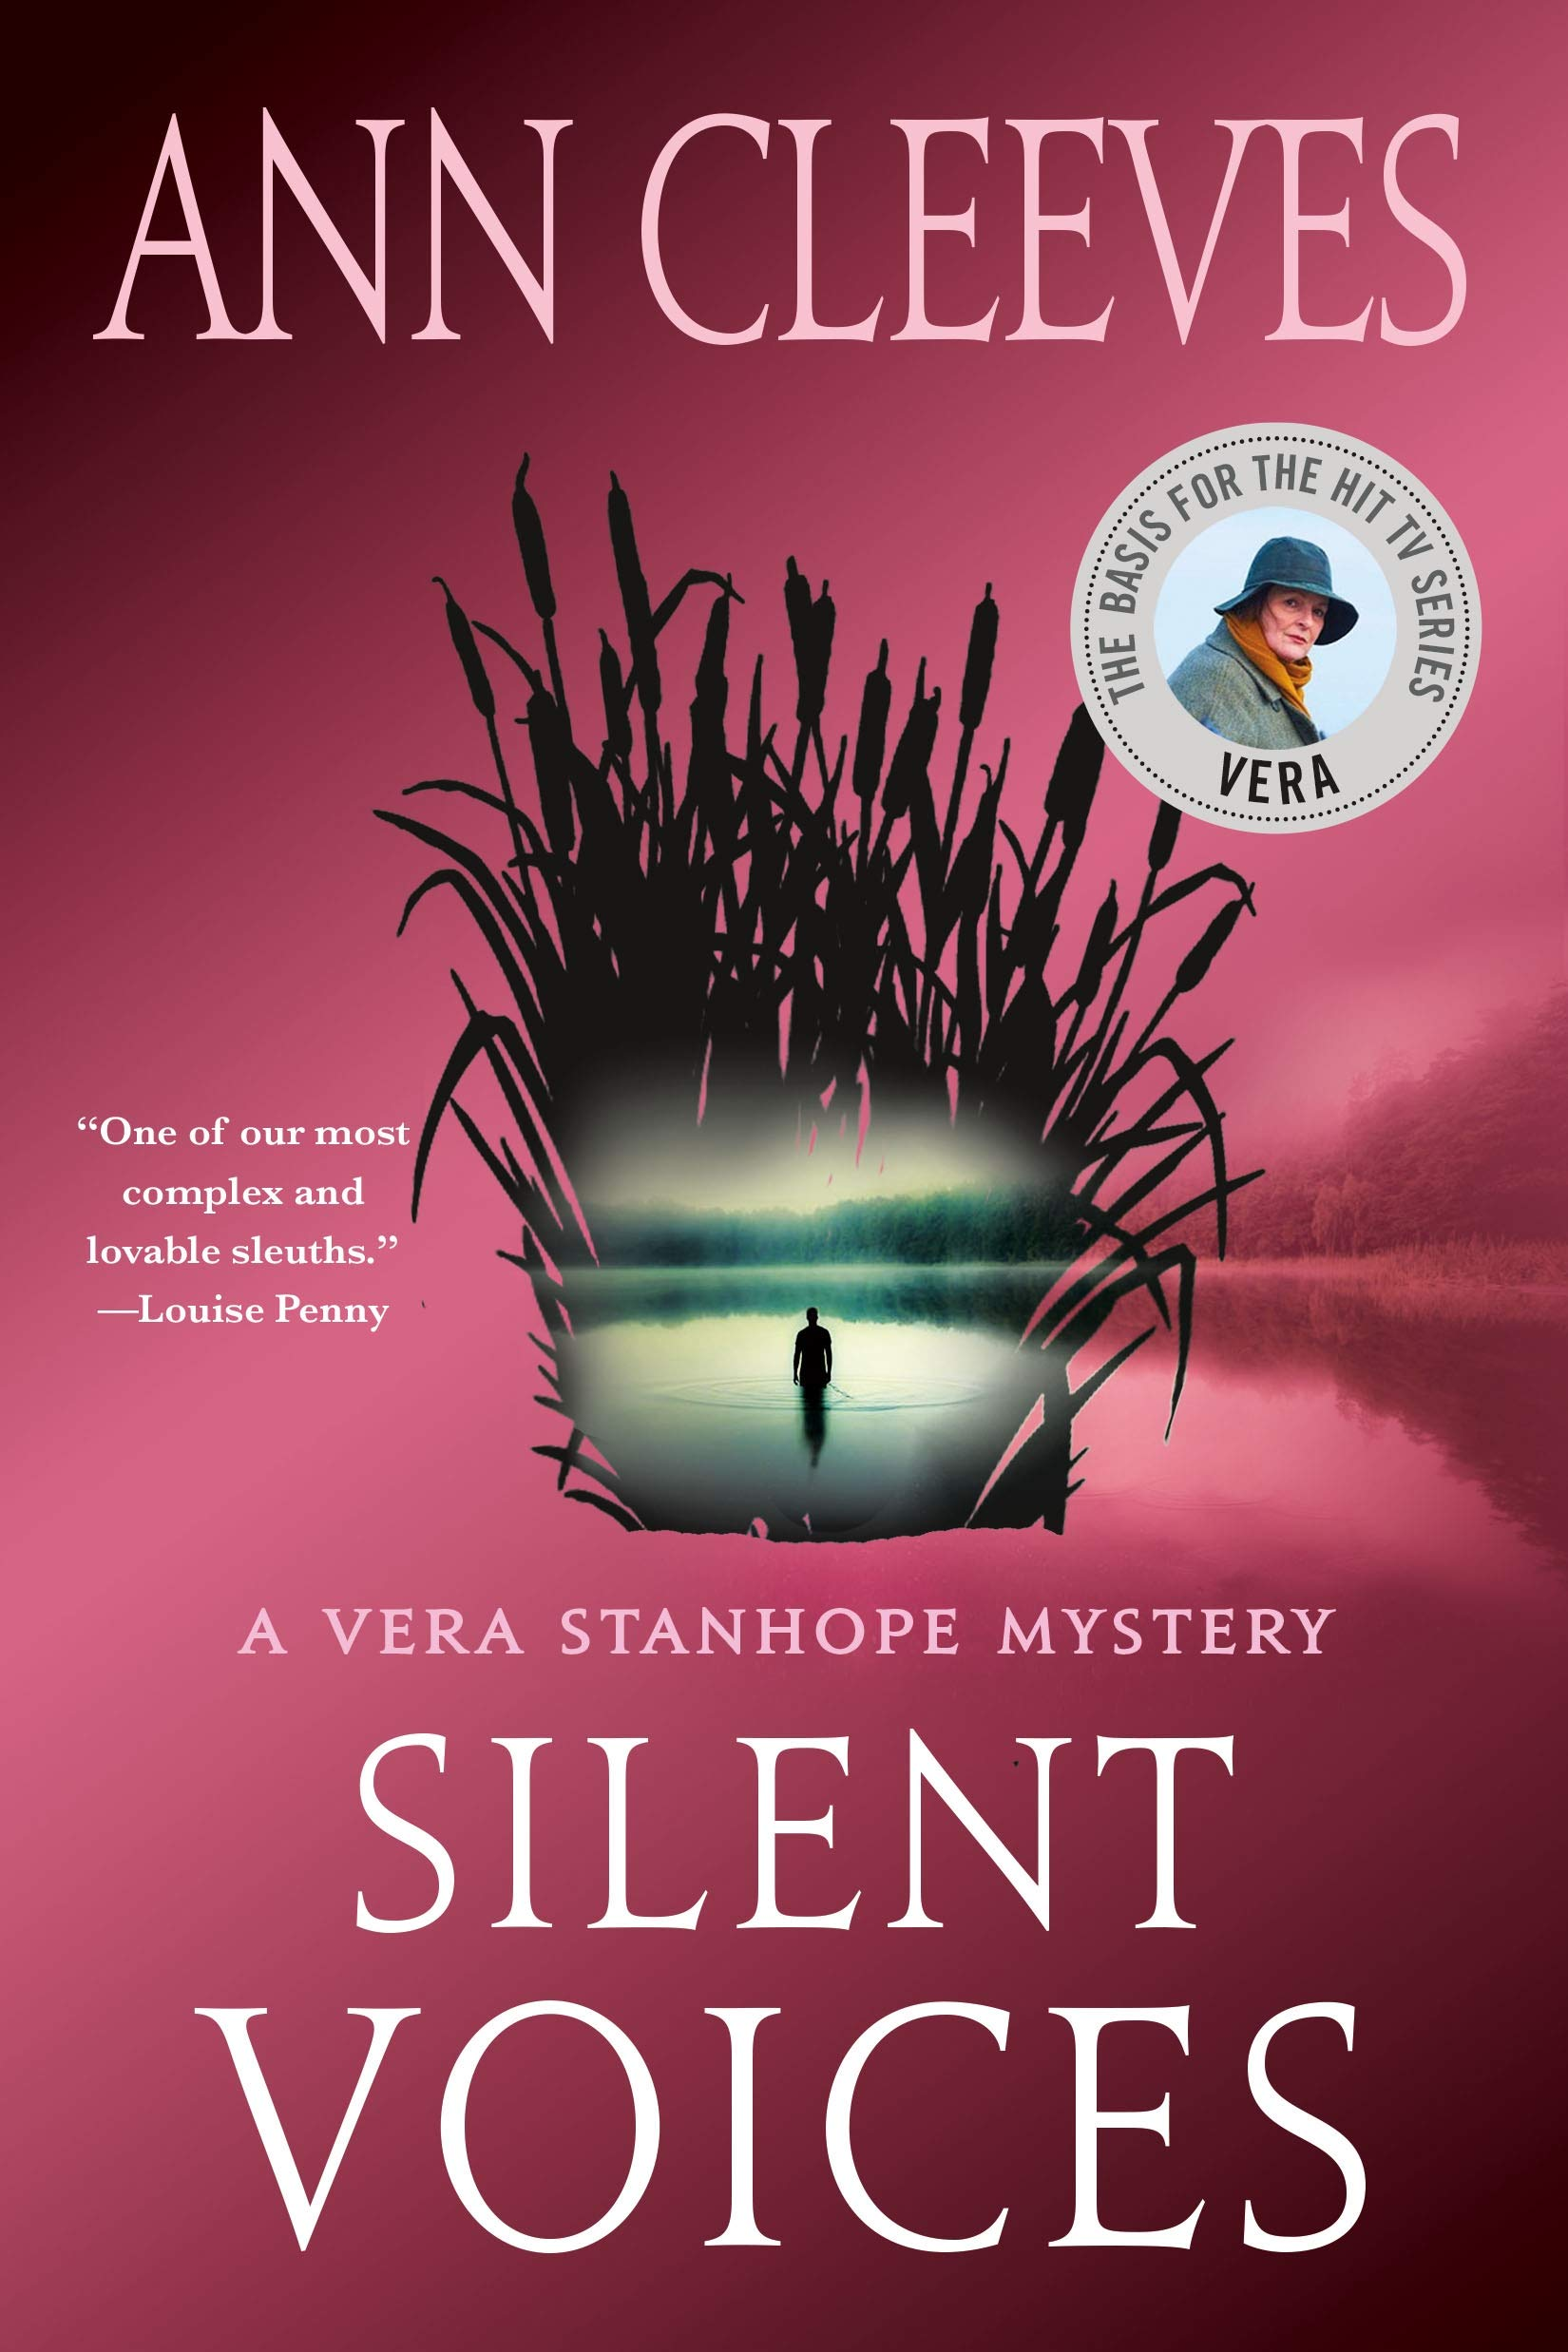 Silent Voices: A Vera Stanhope Mystery (Vera Stanhope series Book 4)